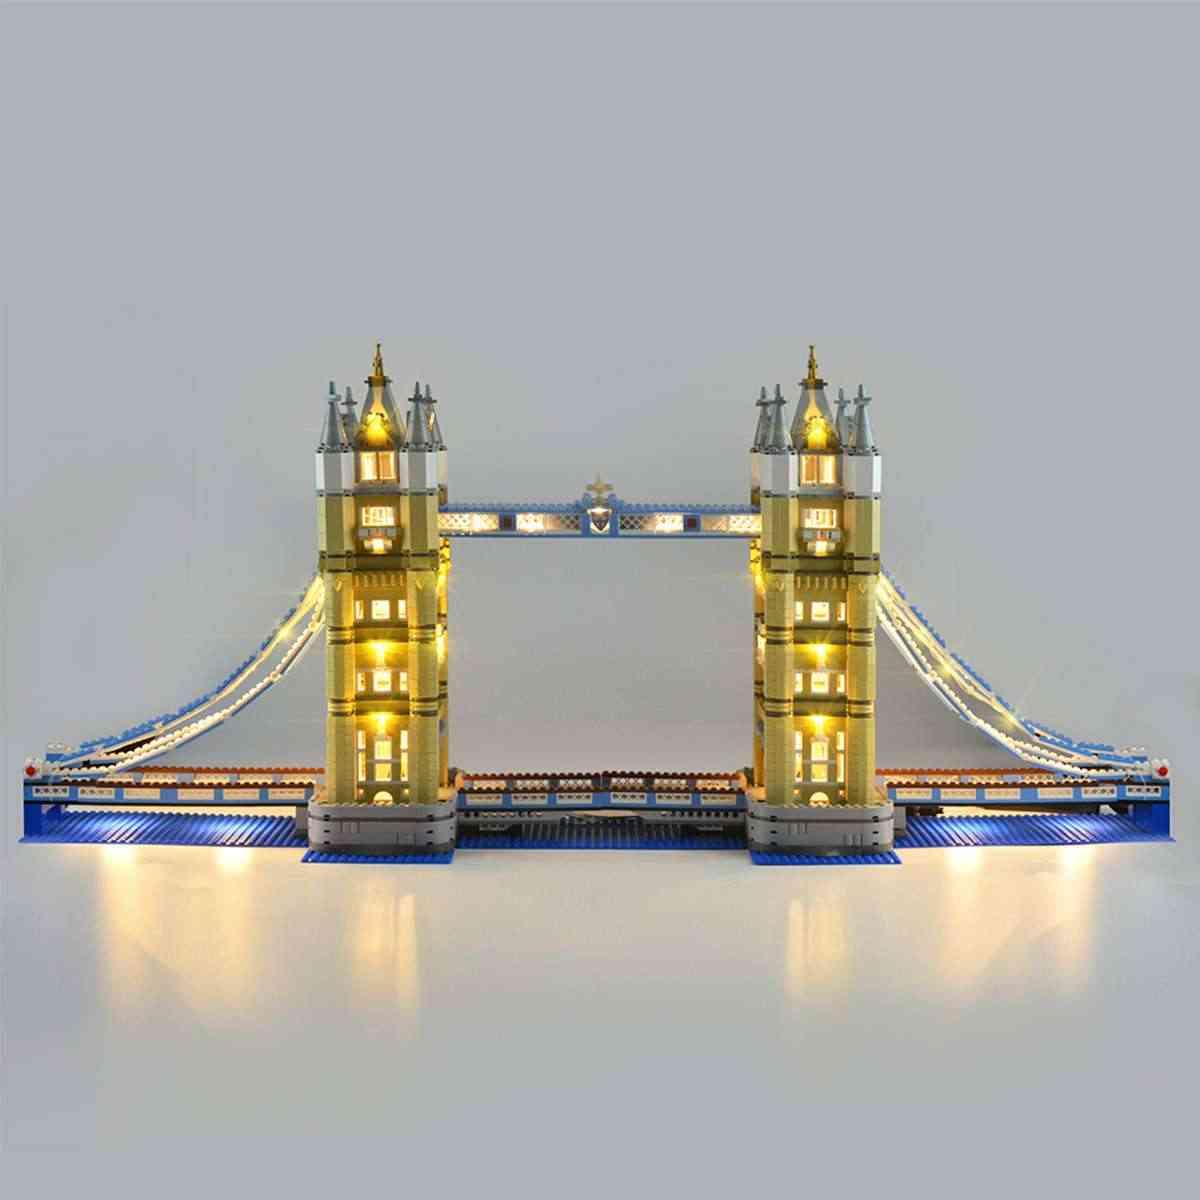 LED Light Kit for Lego 10214 London Tower Bridge Building Blocks Toys Bricks